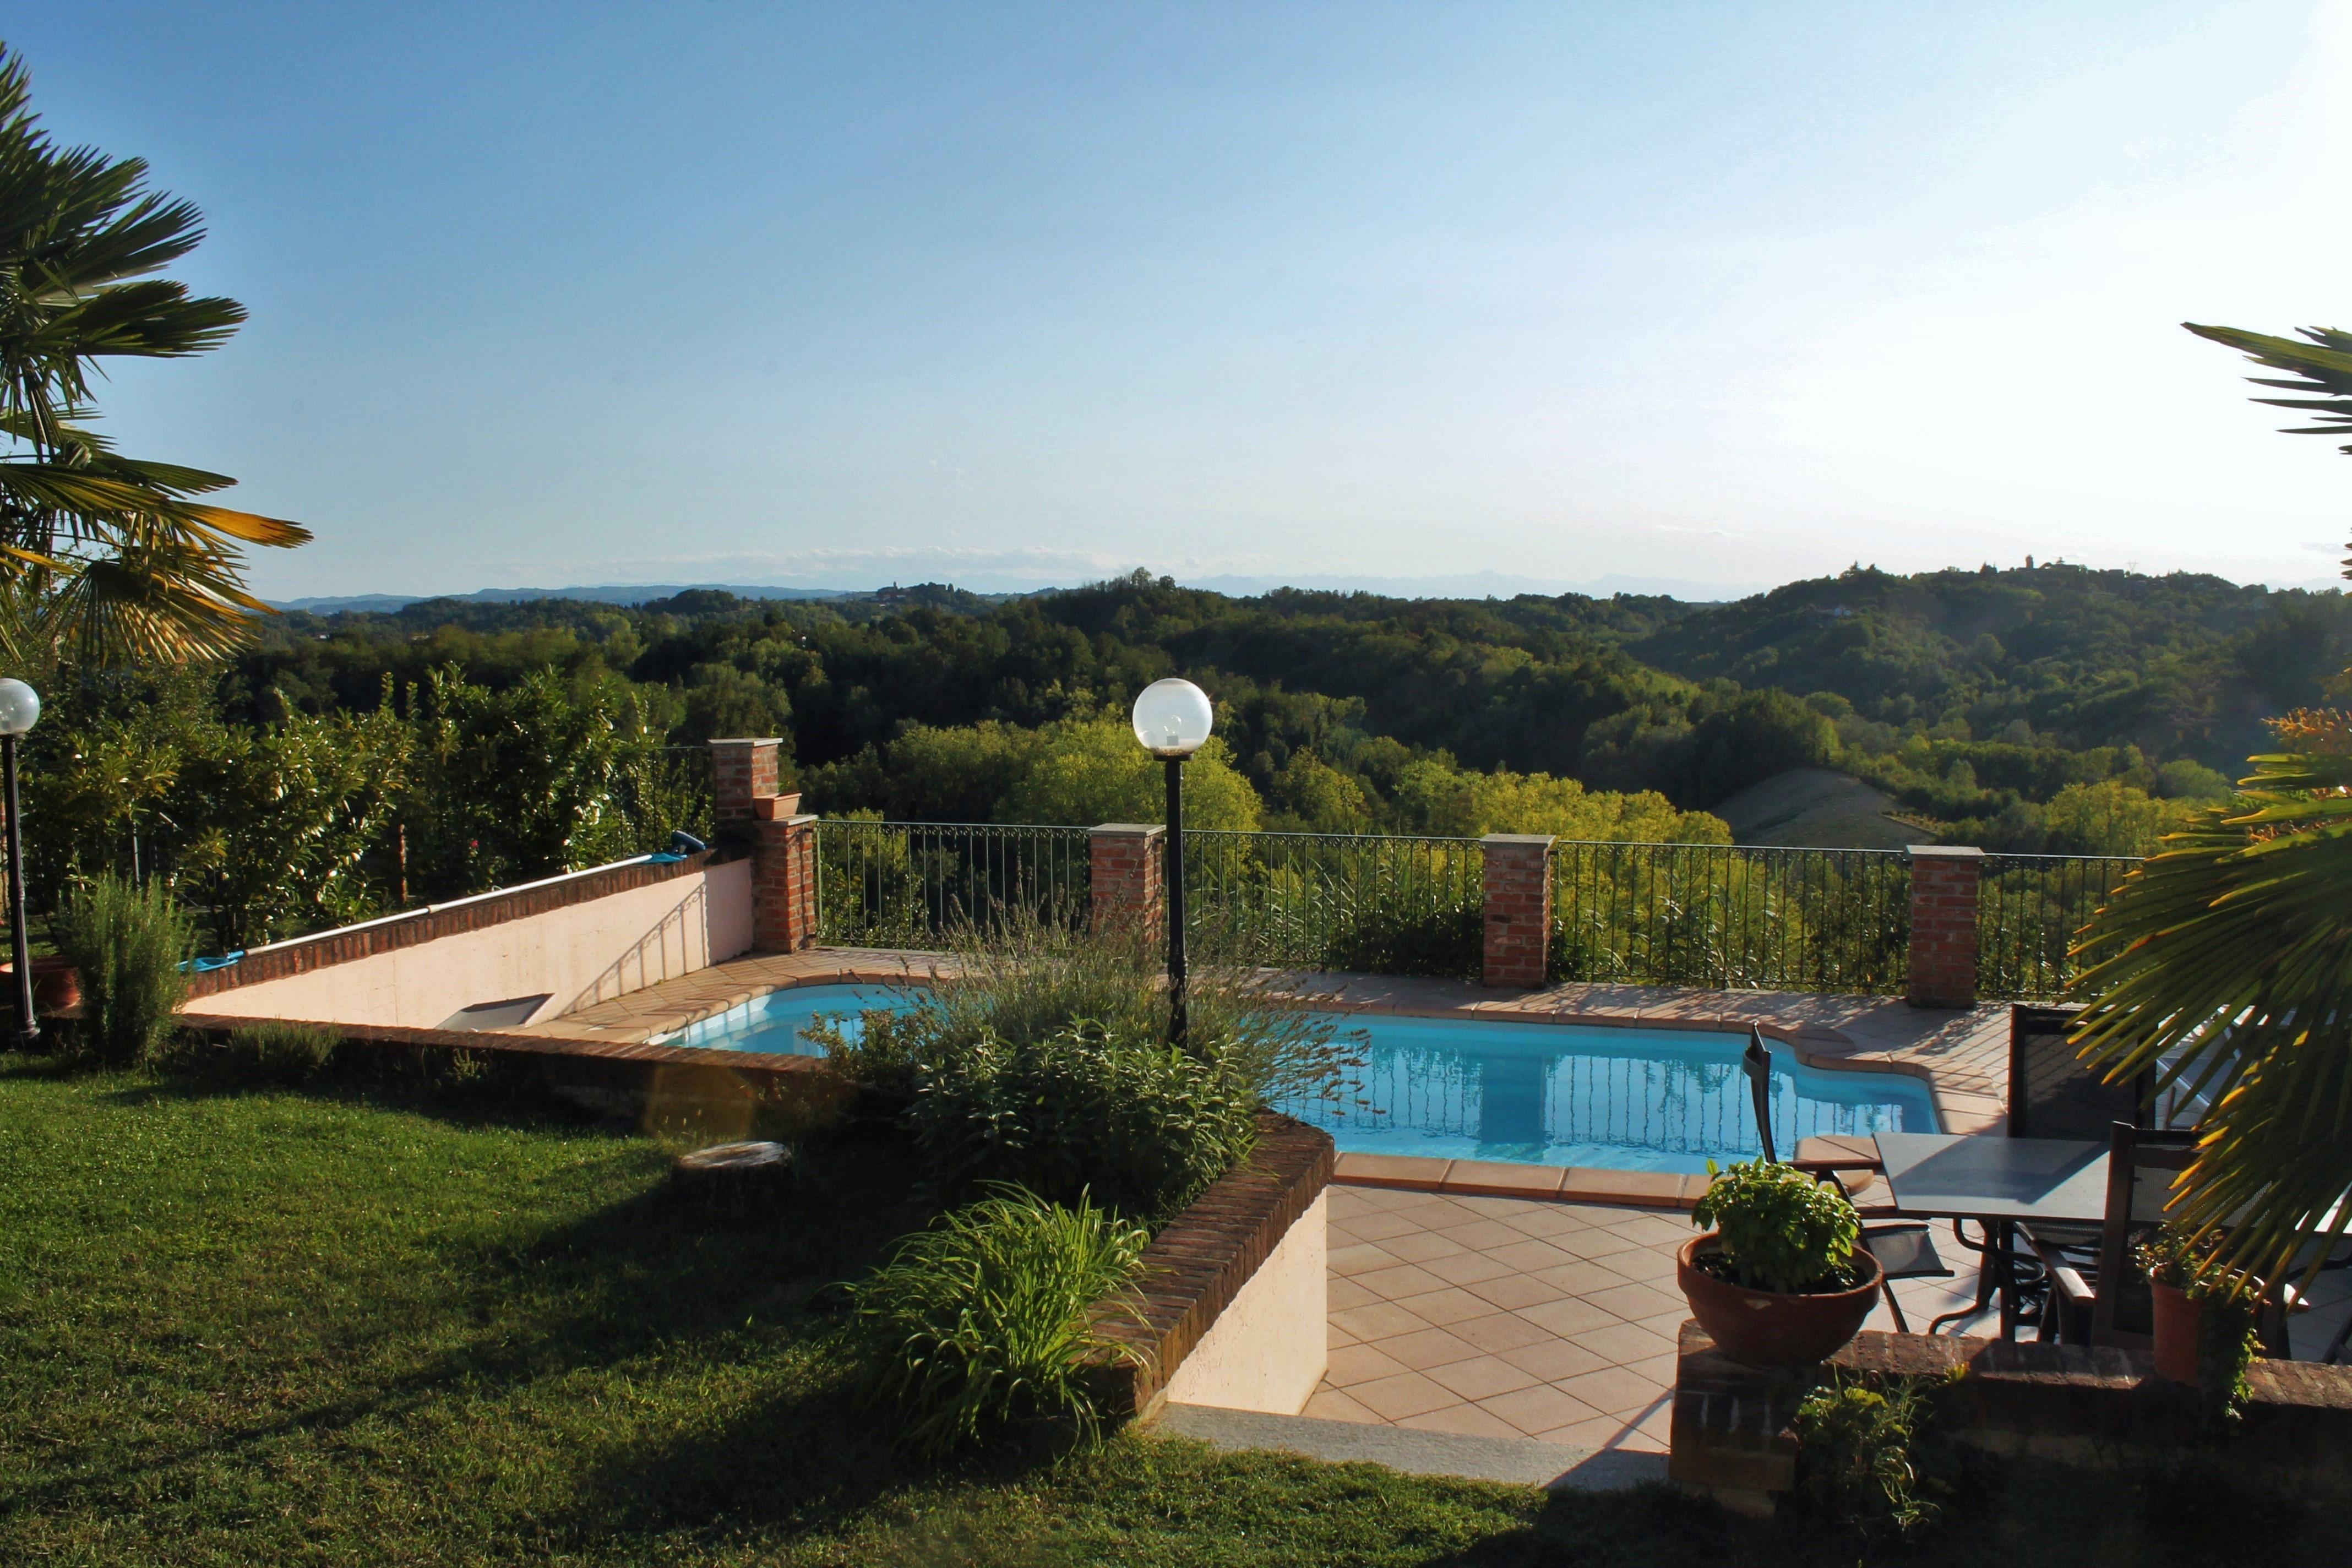 Piscine All Aperto Piemonte casa bricco simone - apartments for rent in asti, piemonte